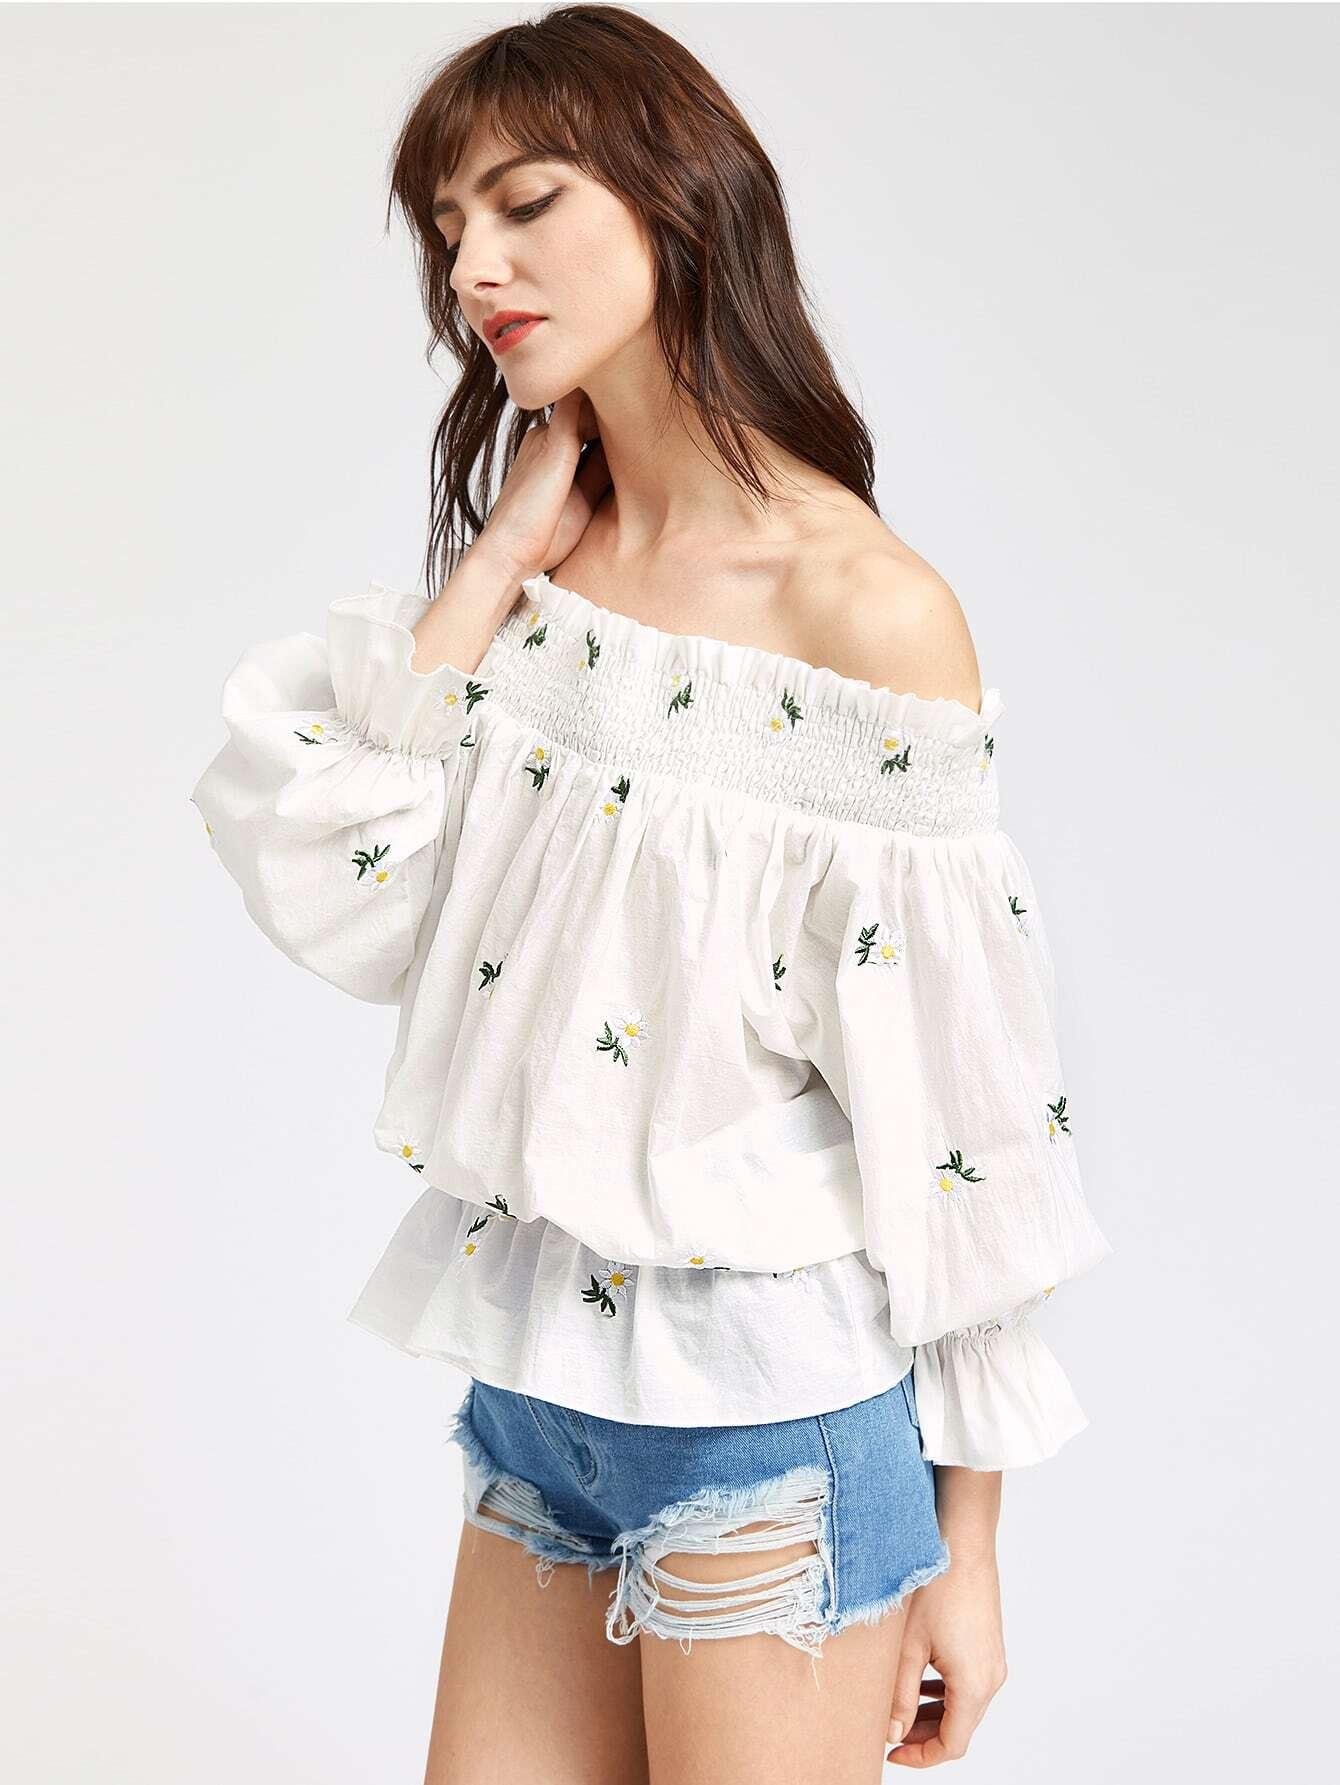 blouse170310708_2